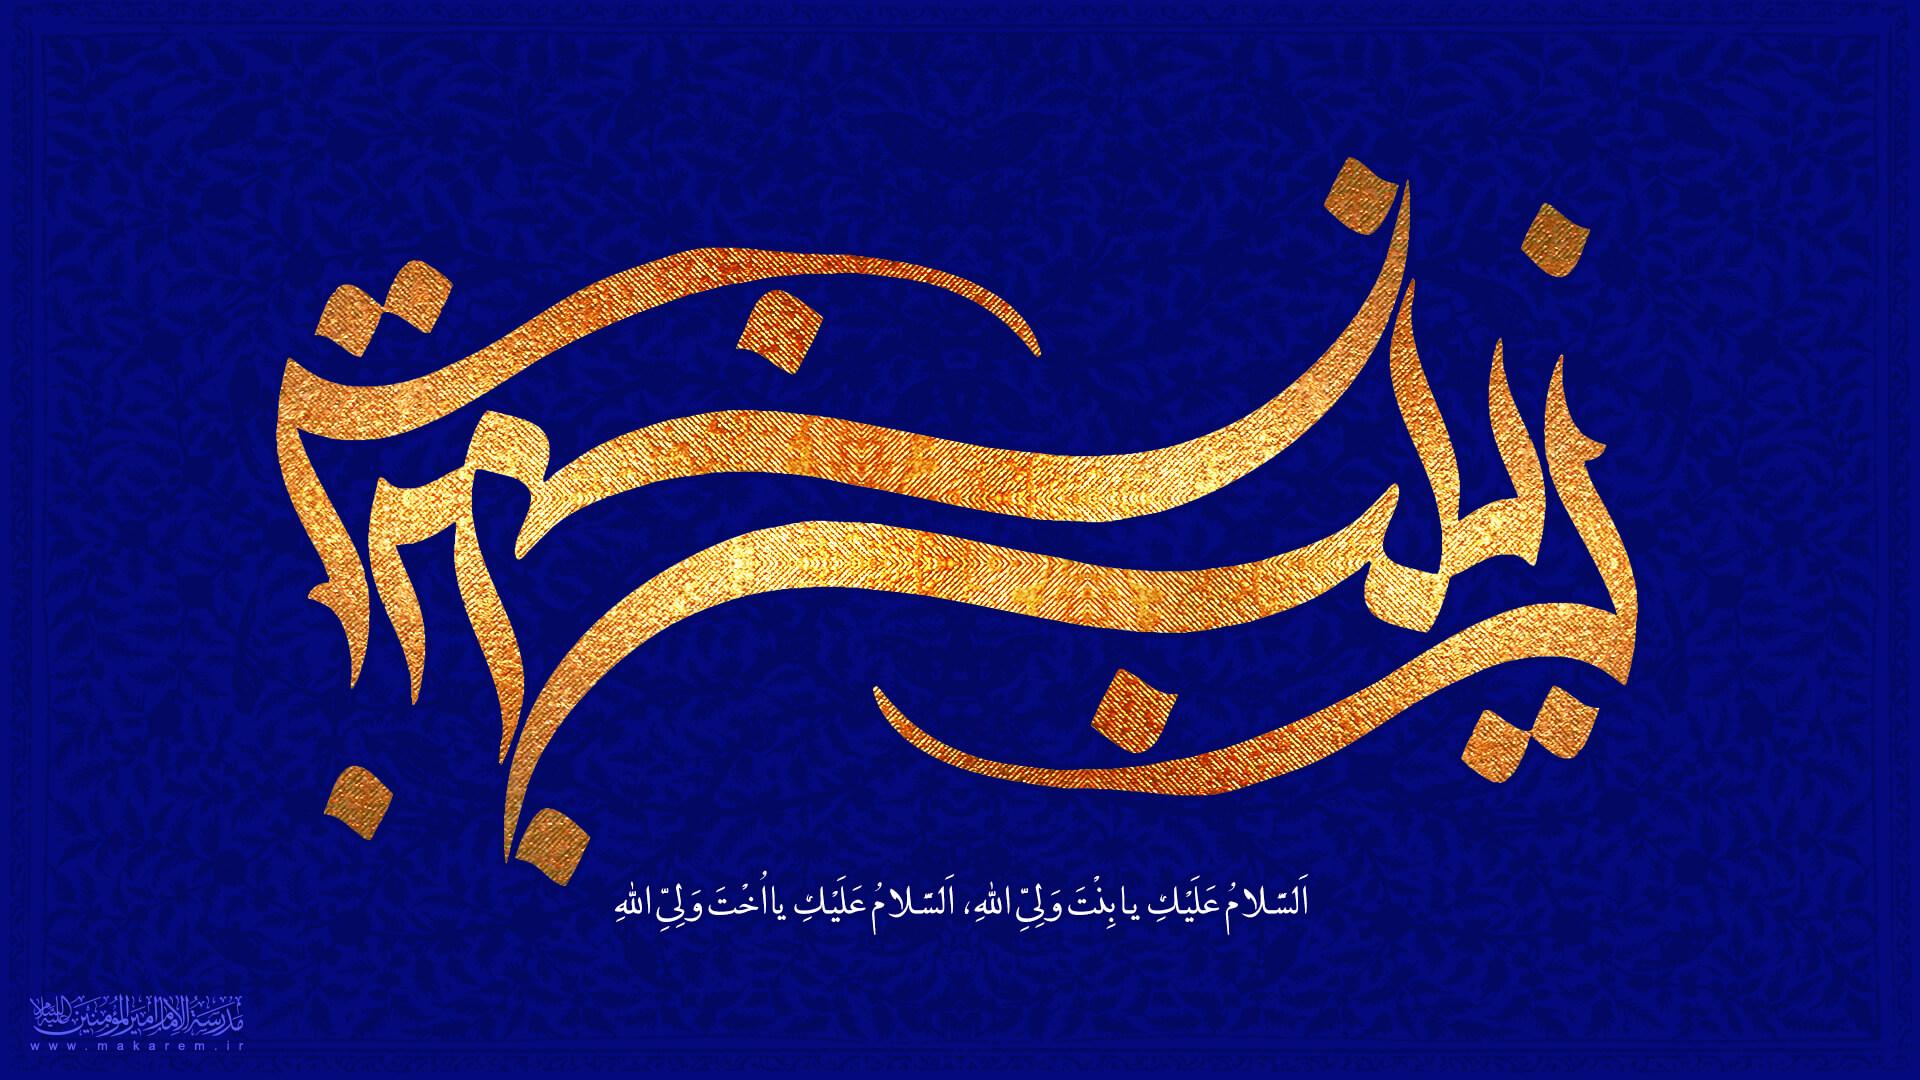 حضرت زینب 01-مدرسه الامام امیر المومنین (ع)